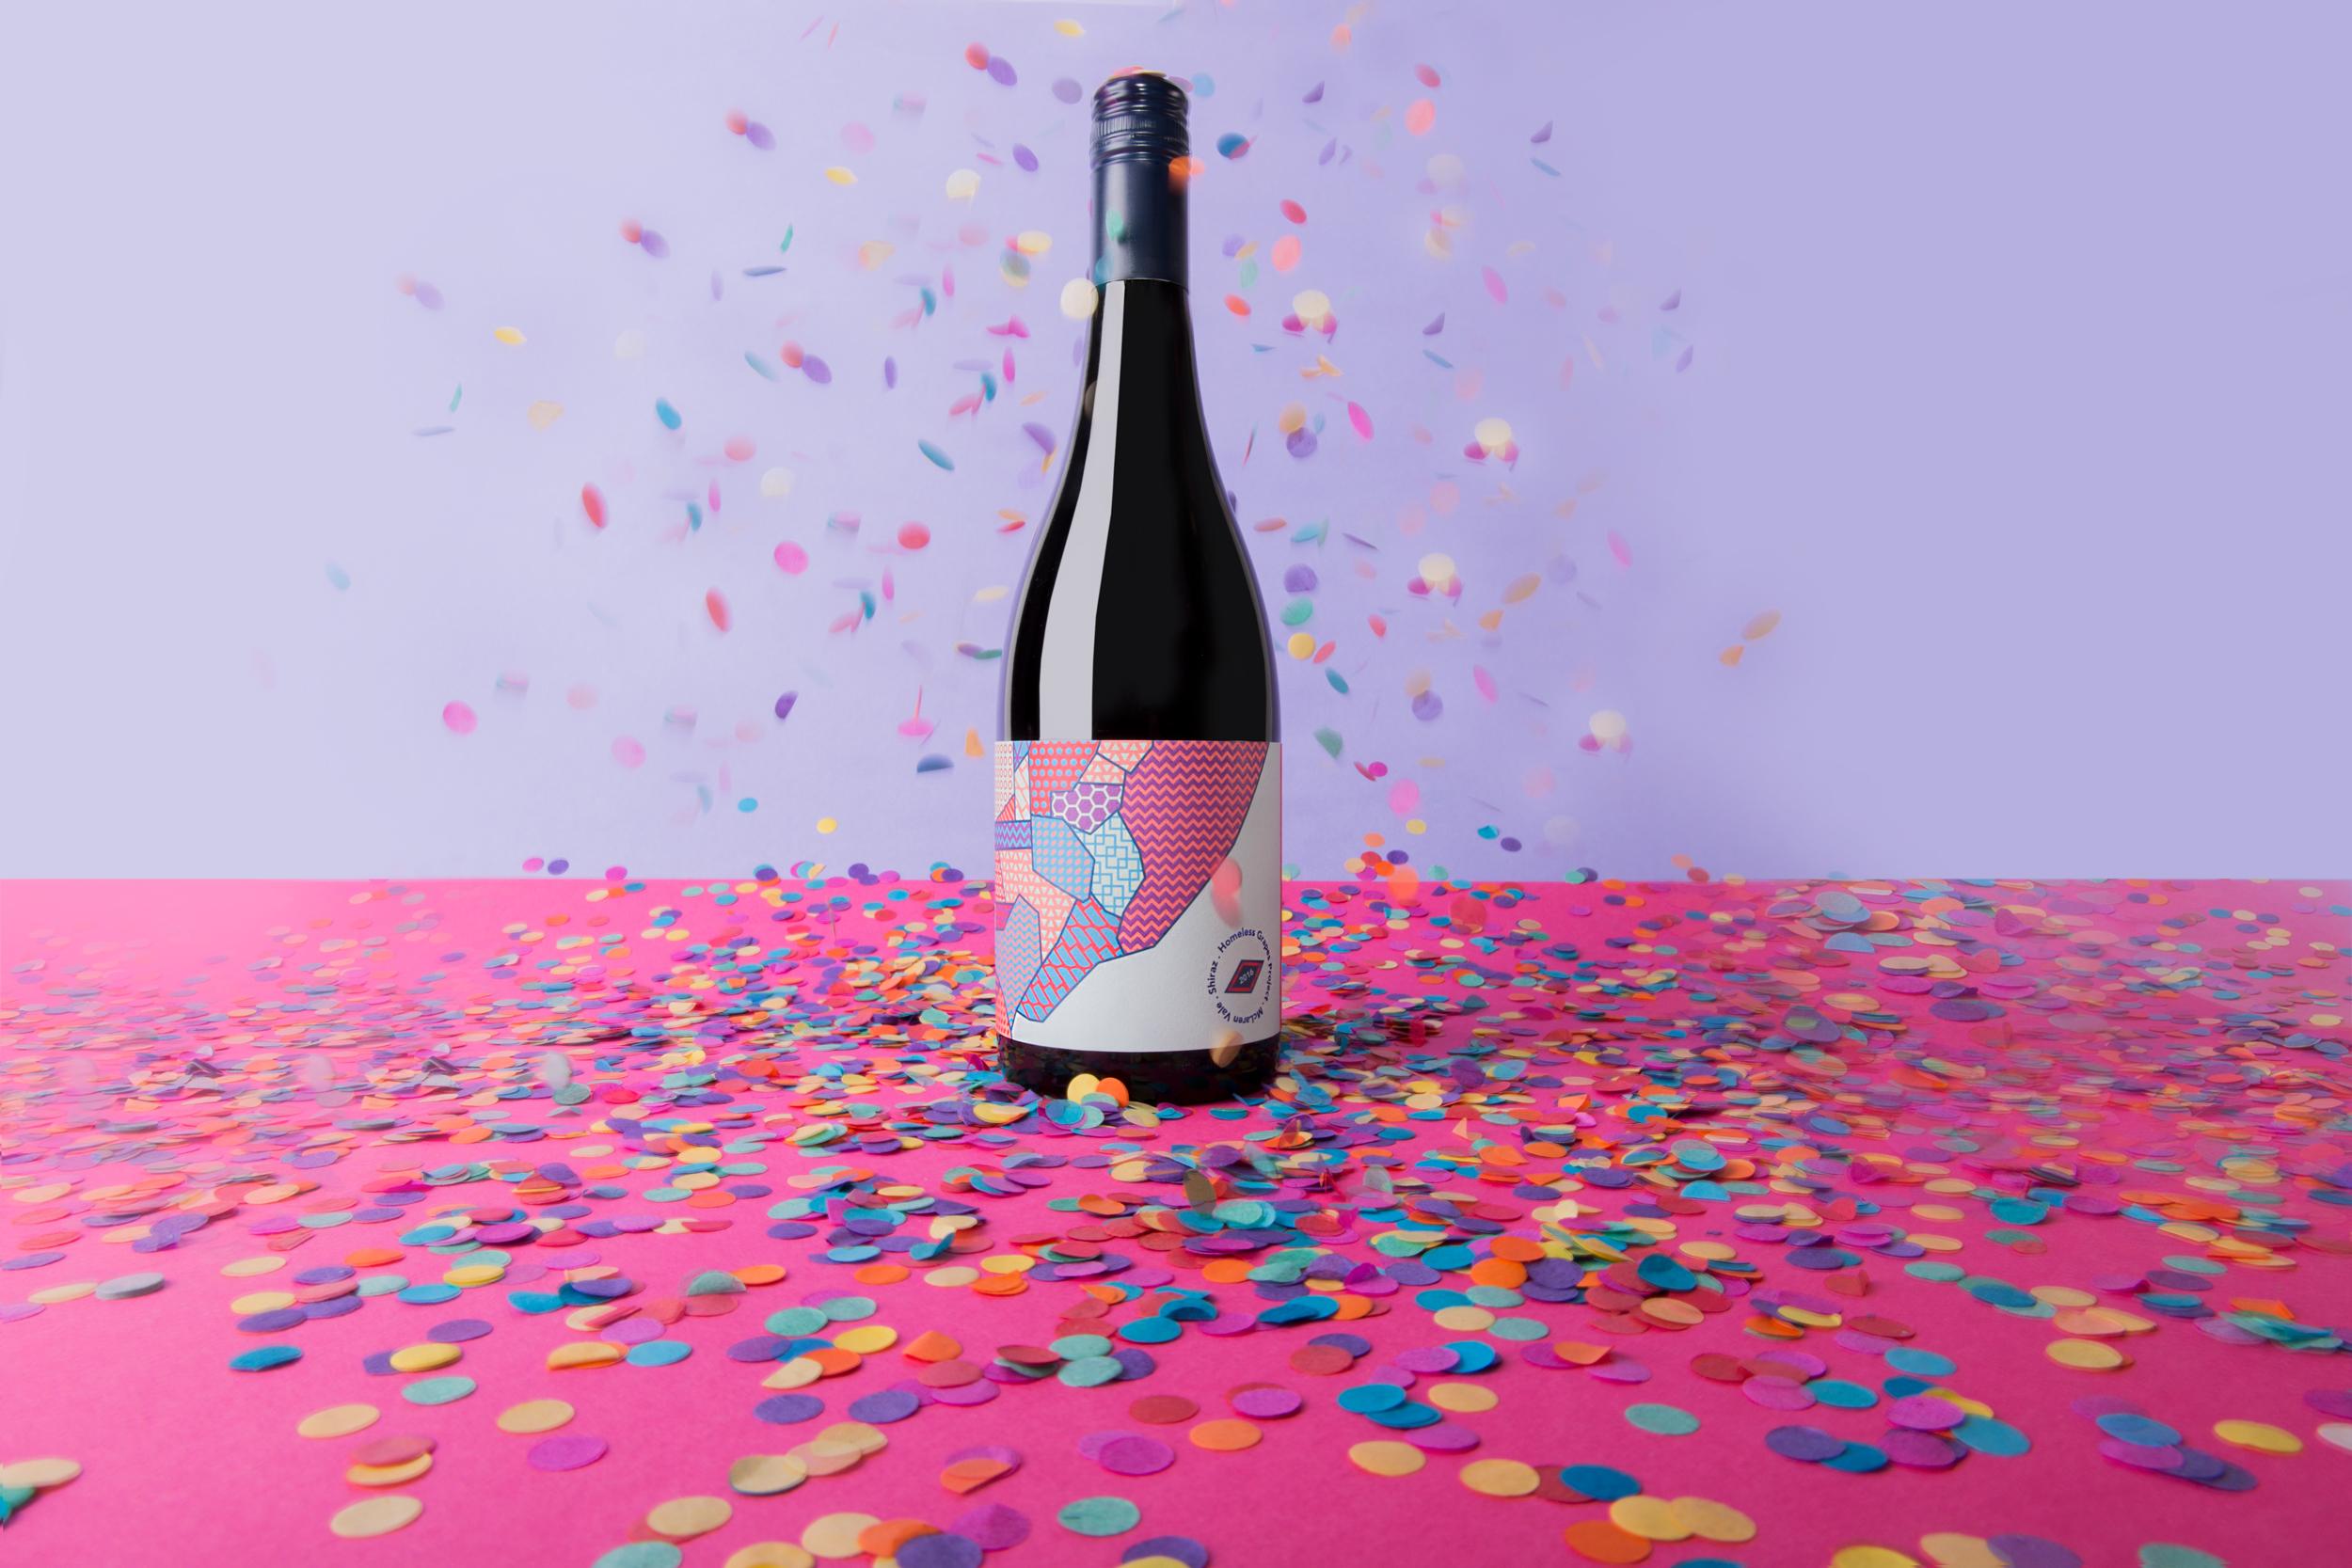 Partner Studio's Wine Label Packaging Design that Celebrates Humanity